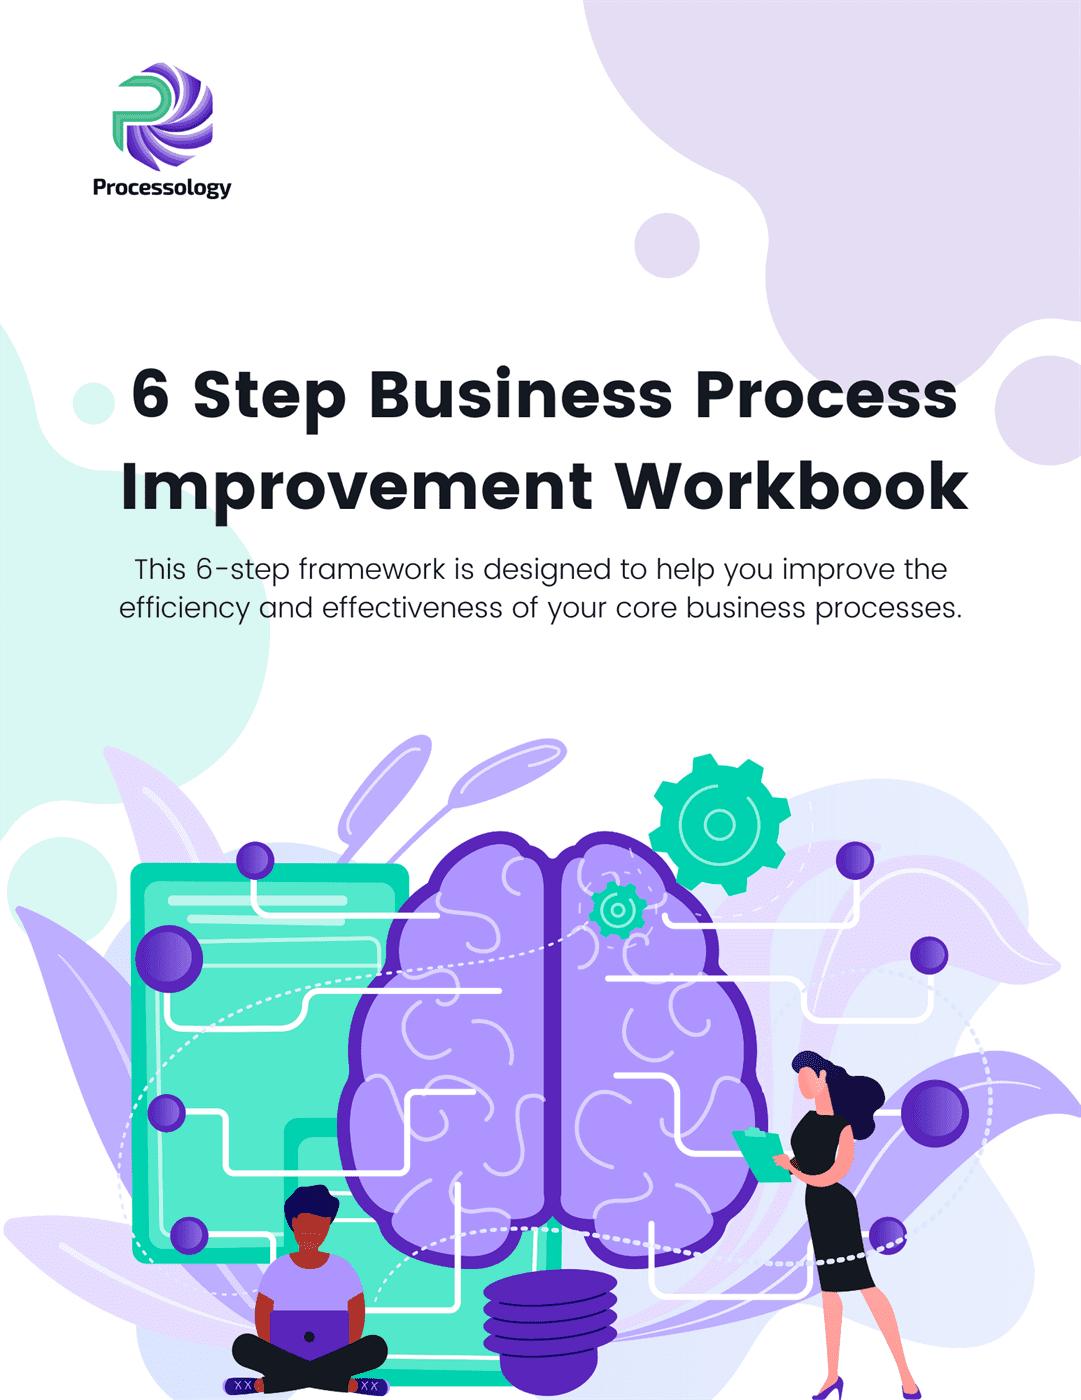 Process Improvement Workbook